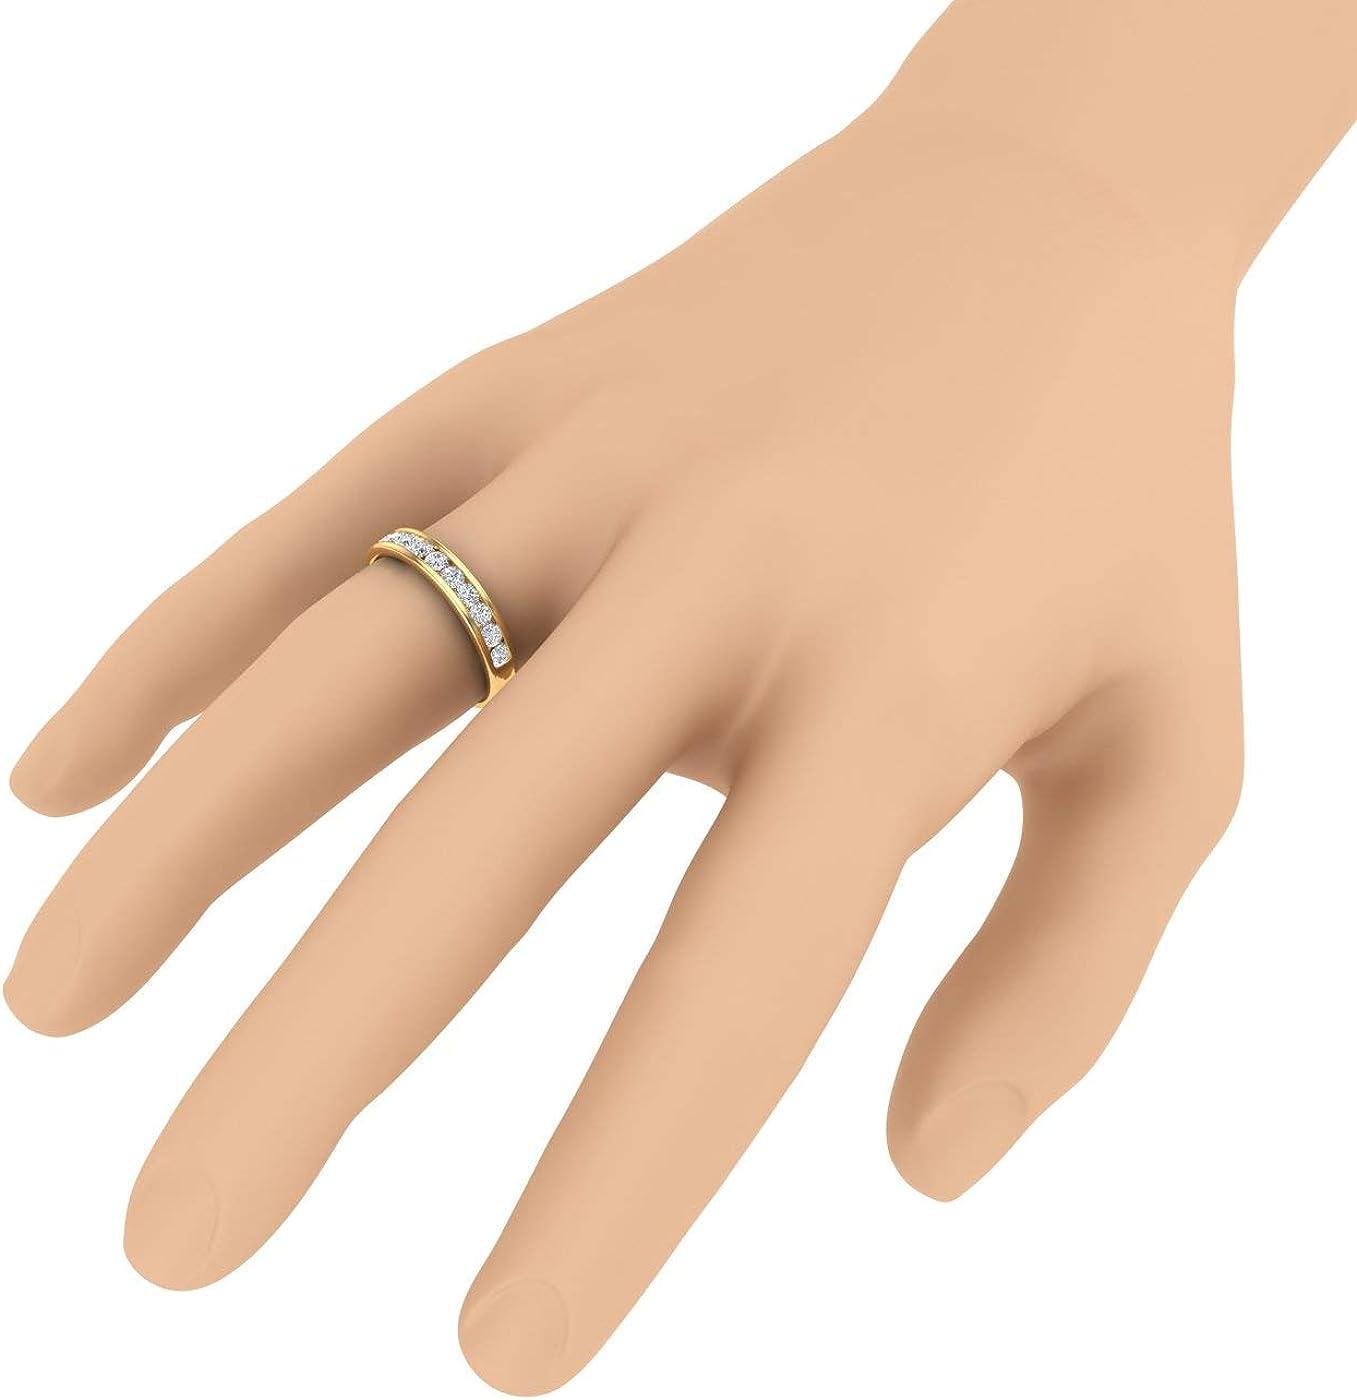 1/2 Carat to 1 Carat Channel Set Diamond Wedding Band Ring in 14K Yellow Gold